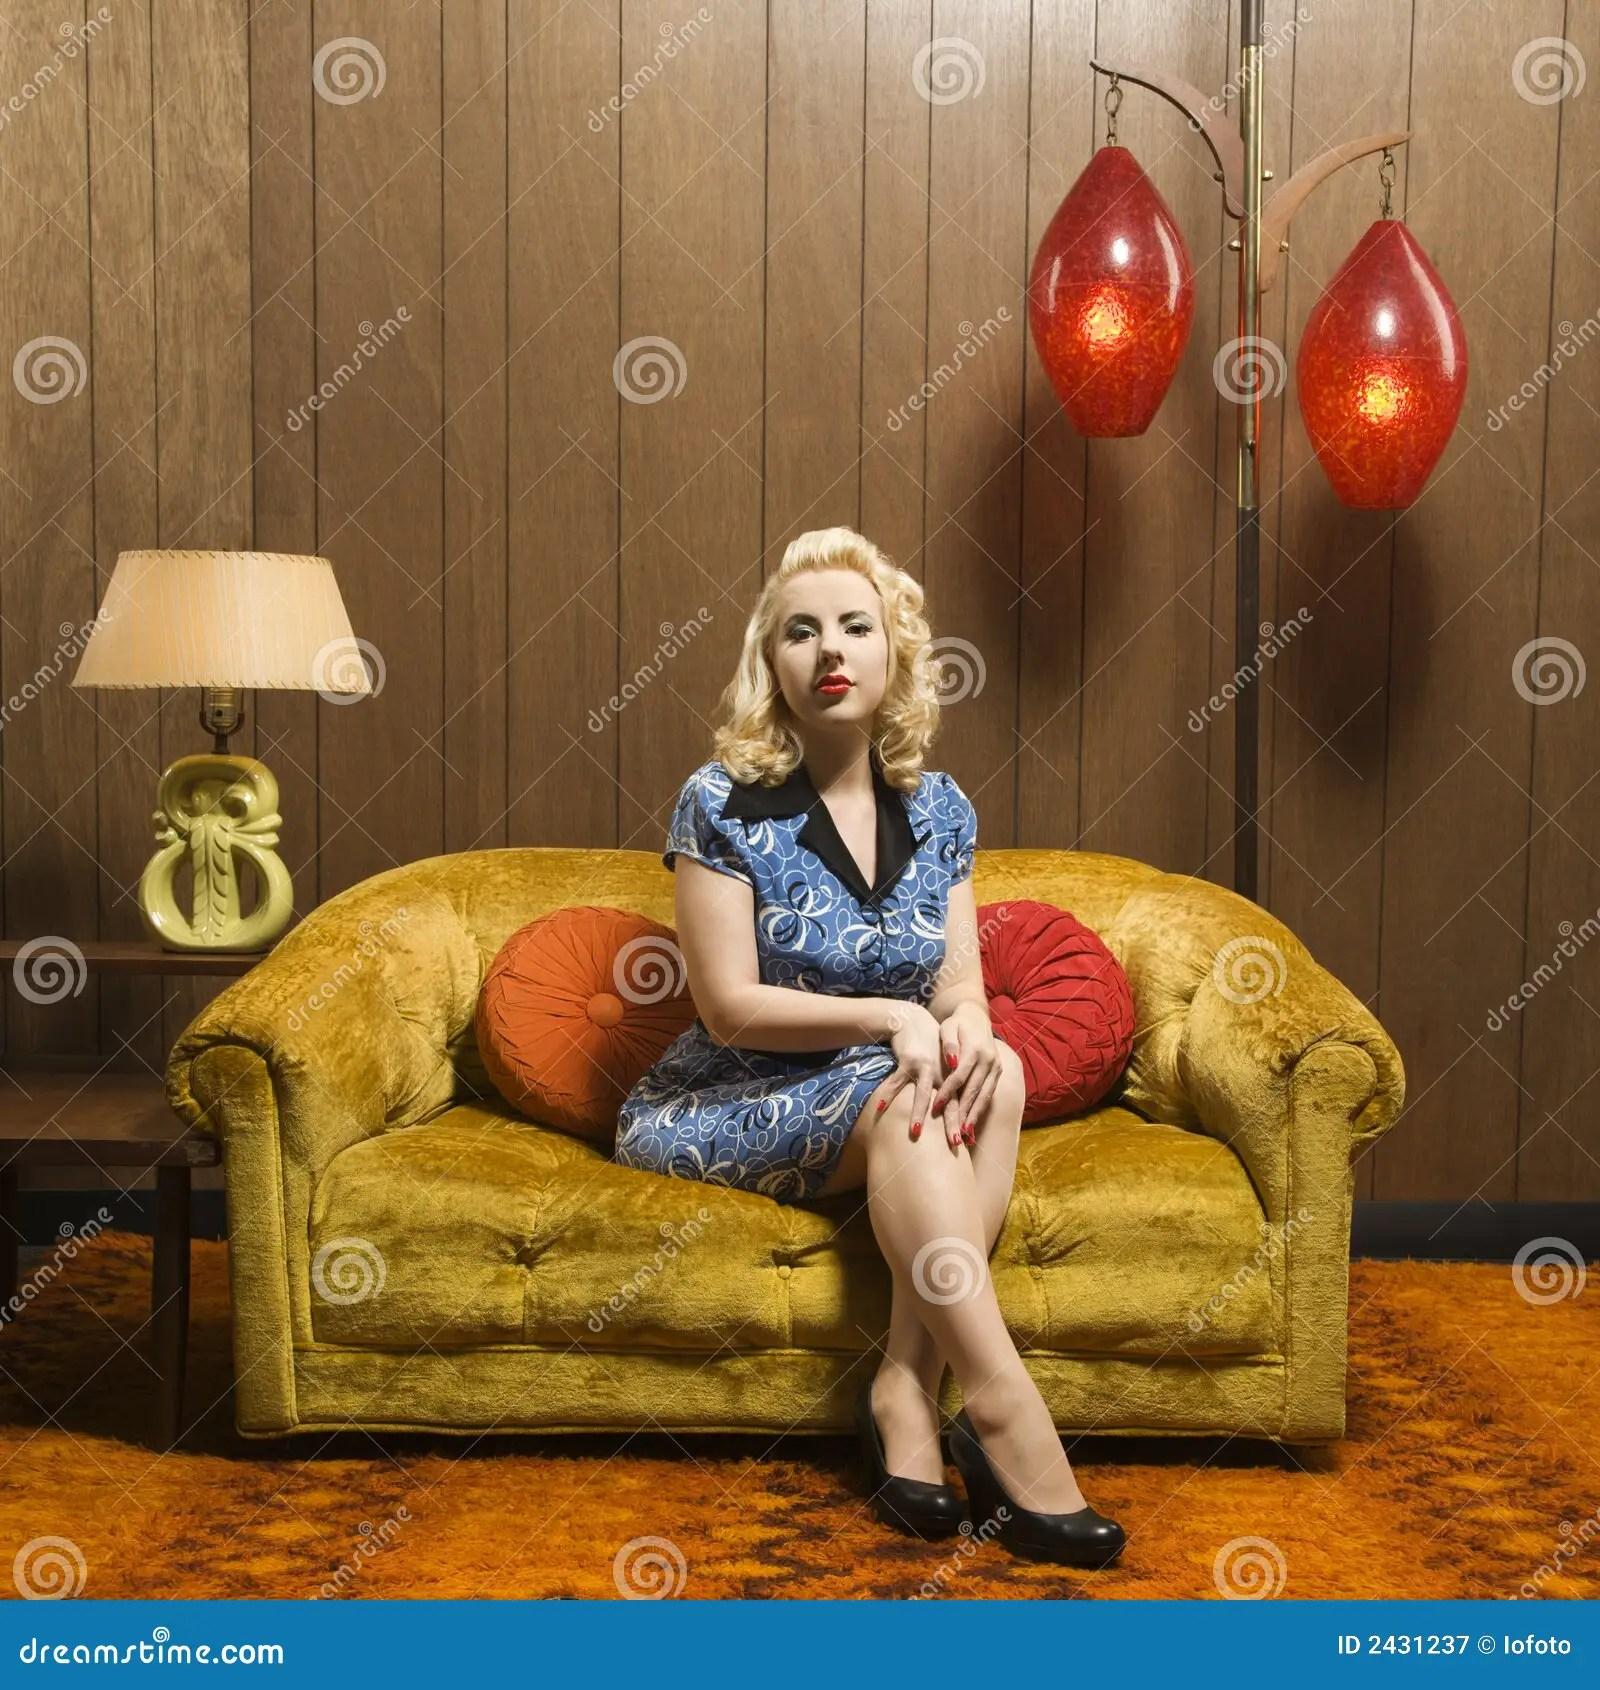 Woman Sitting In Retro Room Stock Image  Image 2431237